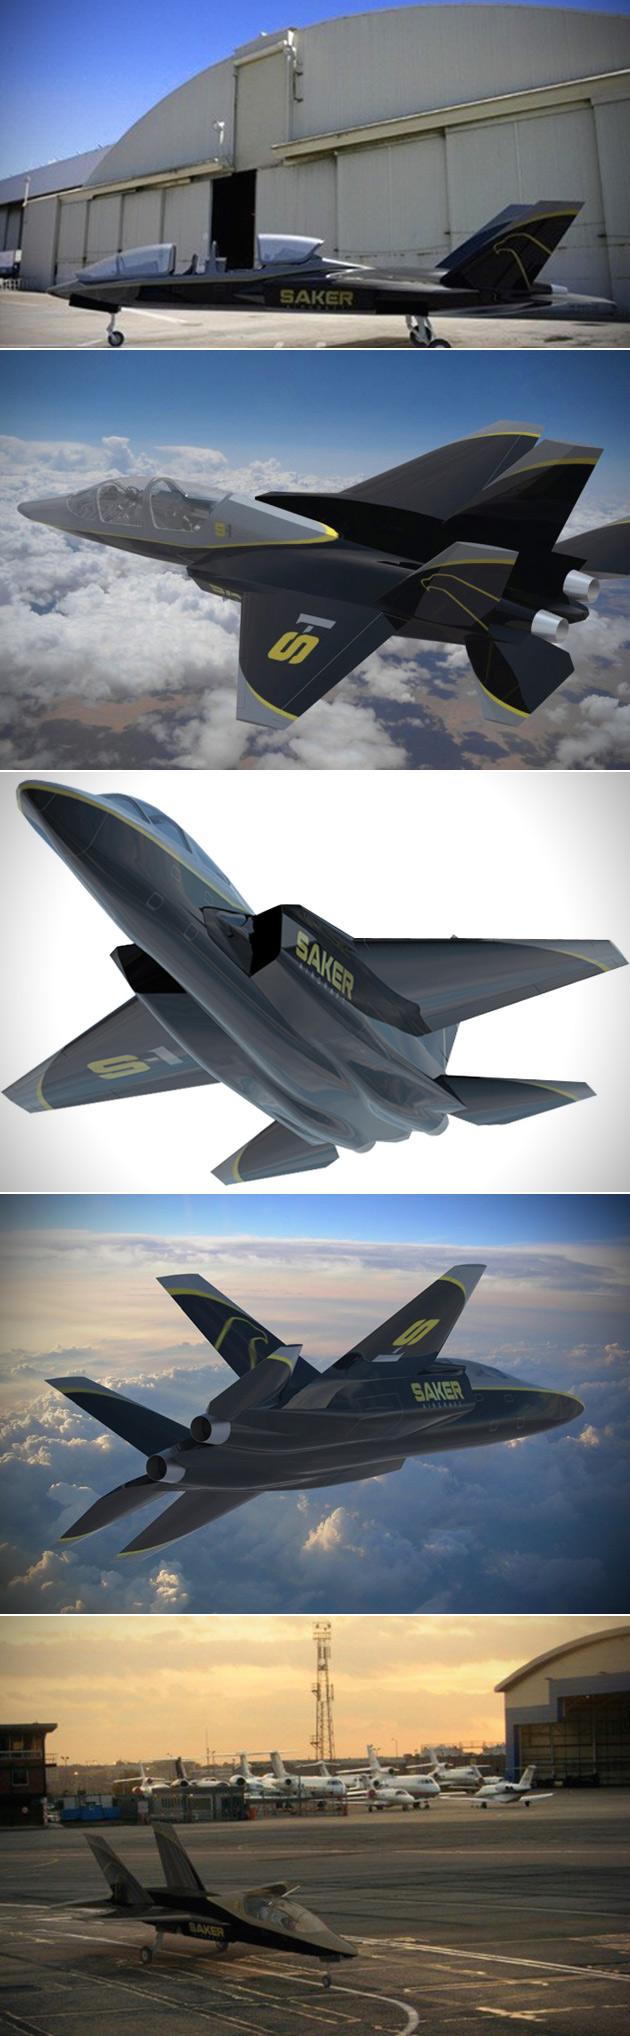 Saker S-1 Fighter Jet Real